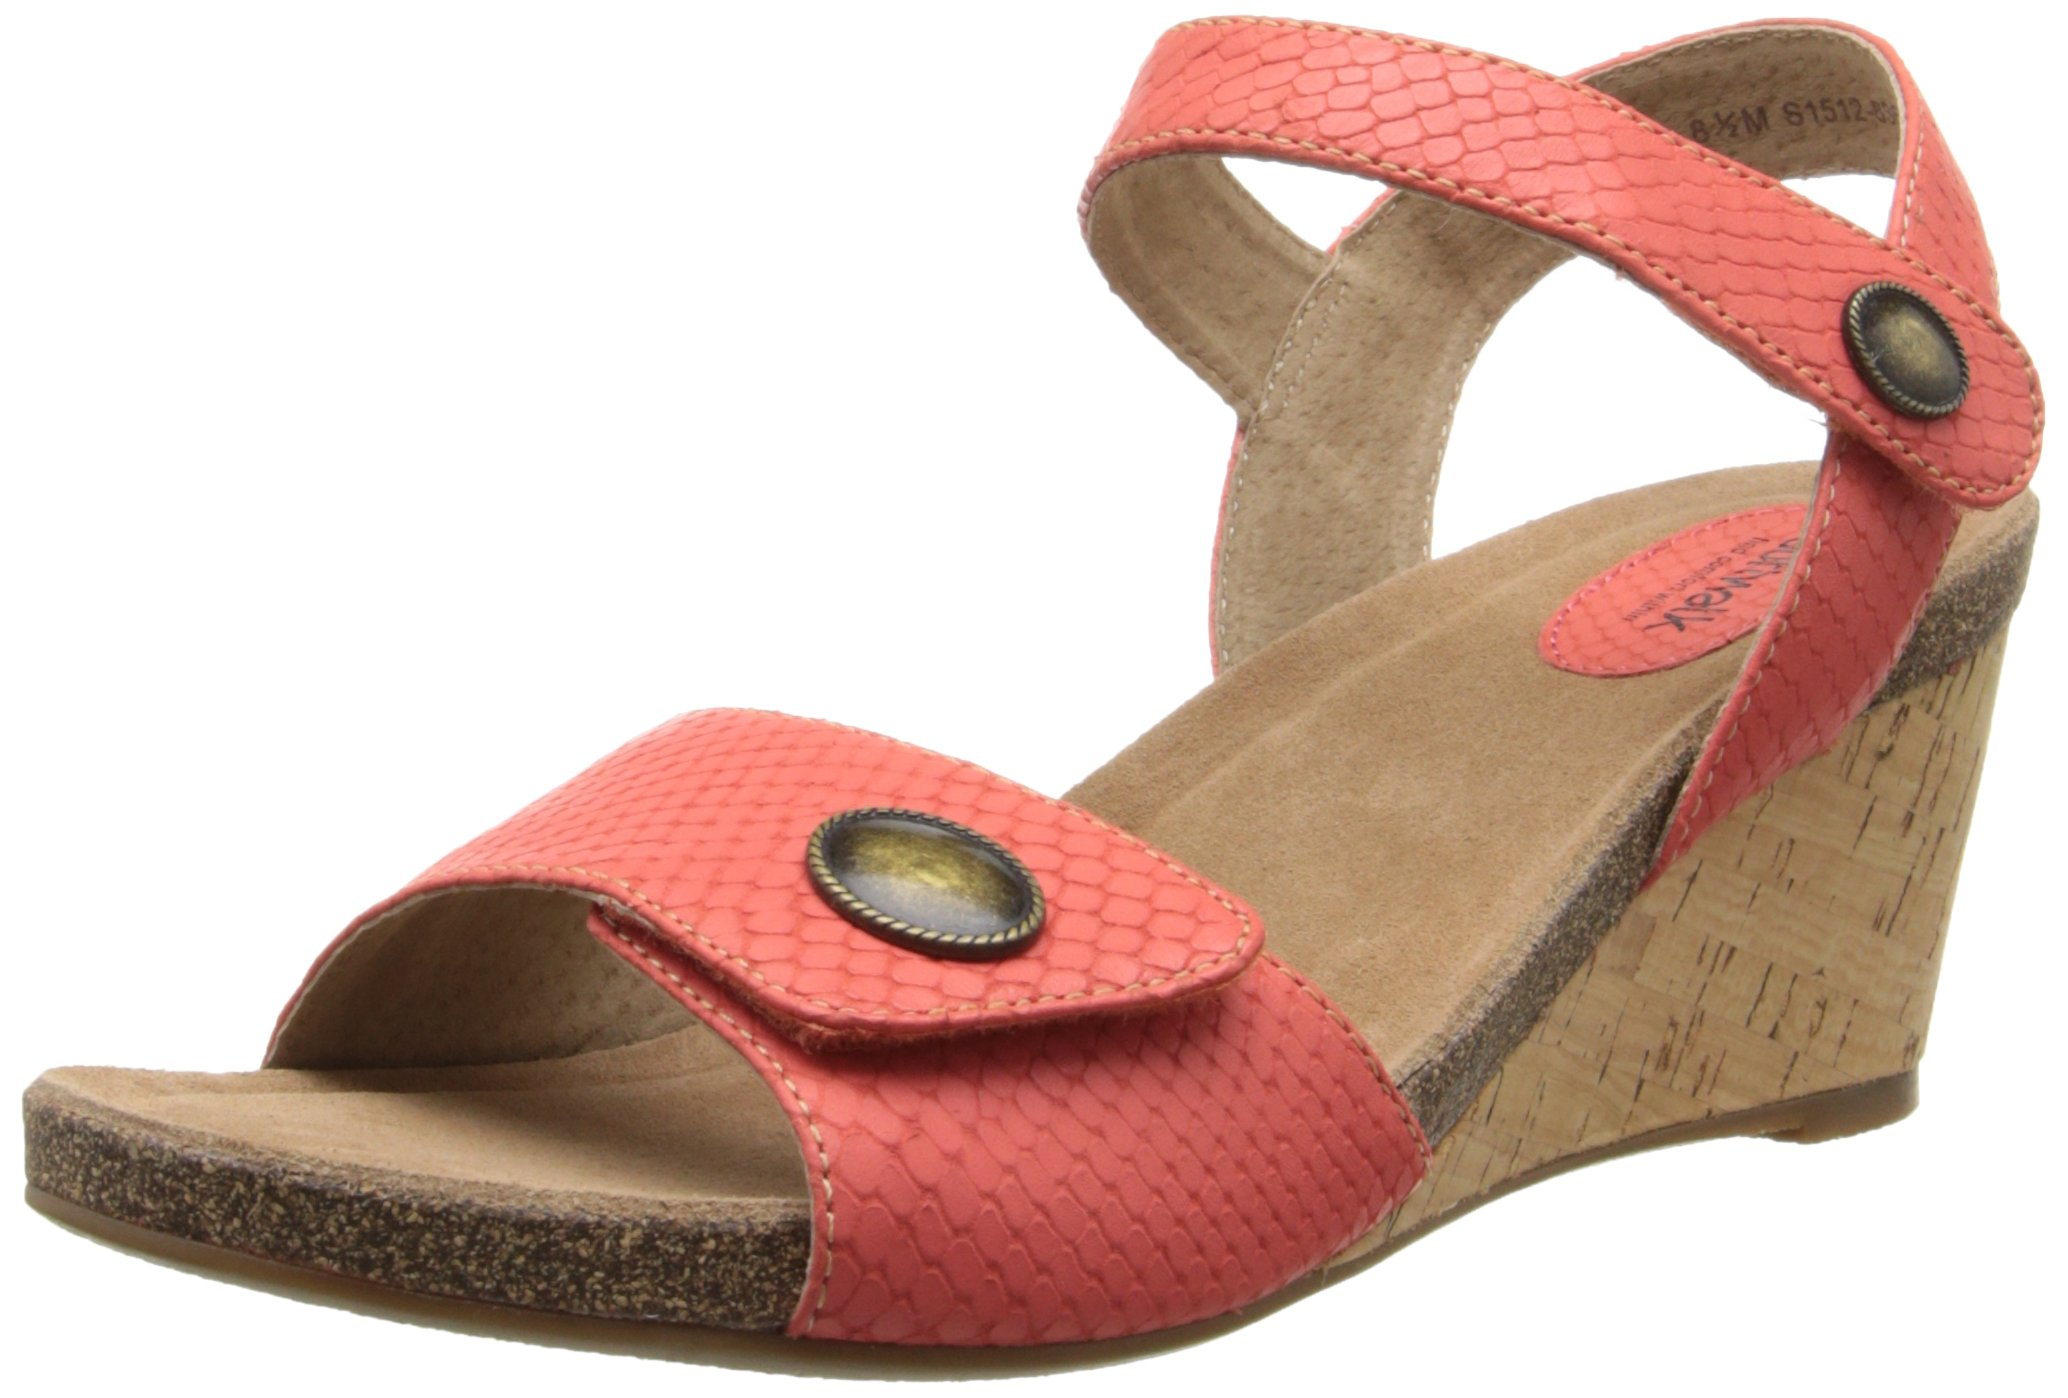 Softwalk Women's Jordan Wedge Sandal, Coral, 7.5 N US by SoftWalk